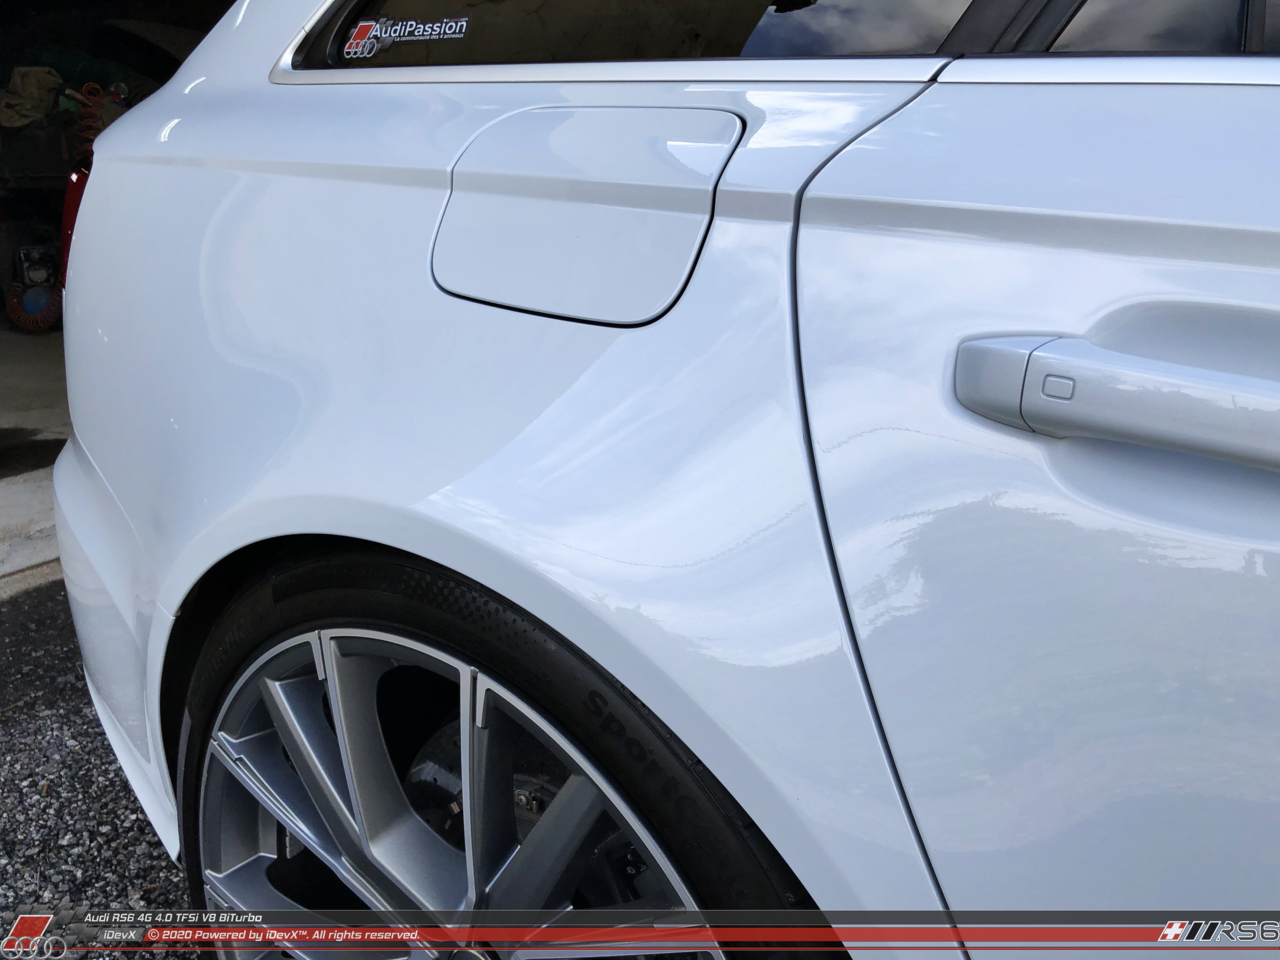 05_08.2019_Audi-RS6_iDevX_049.png